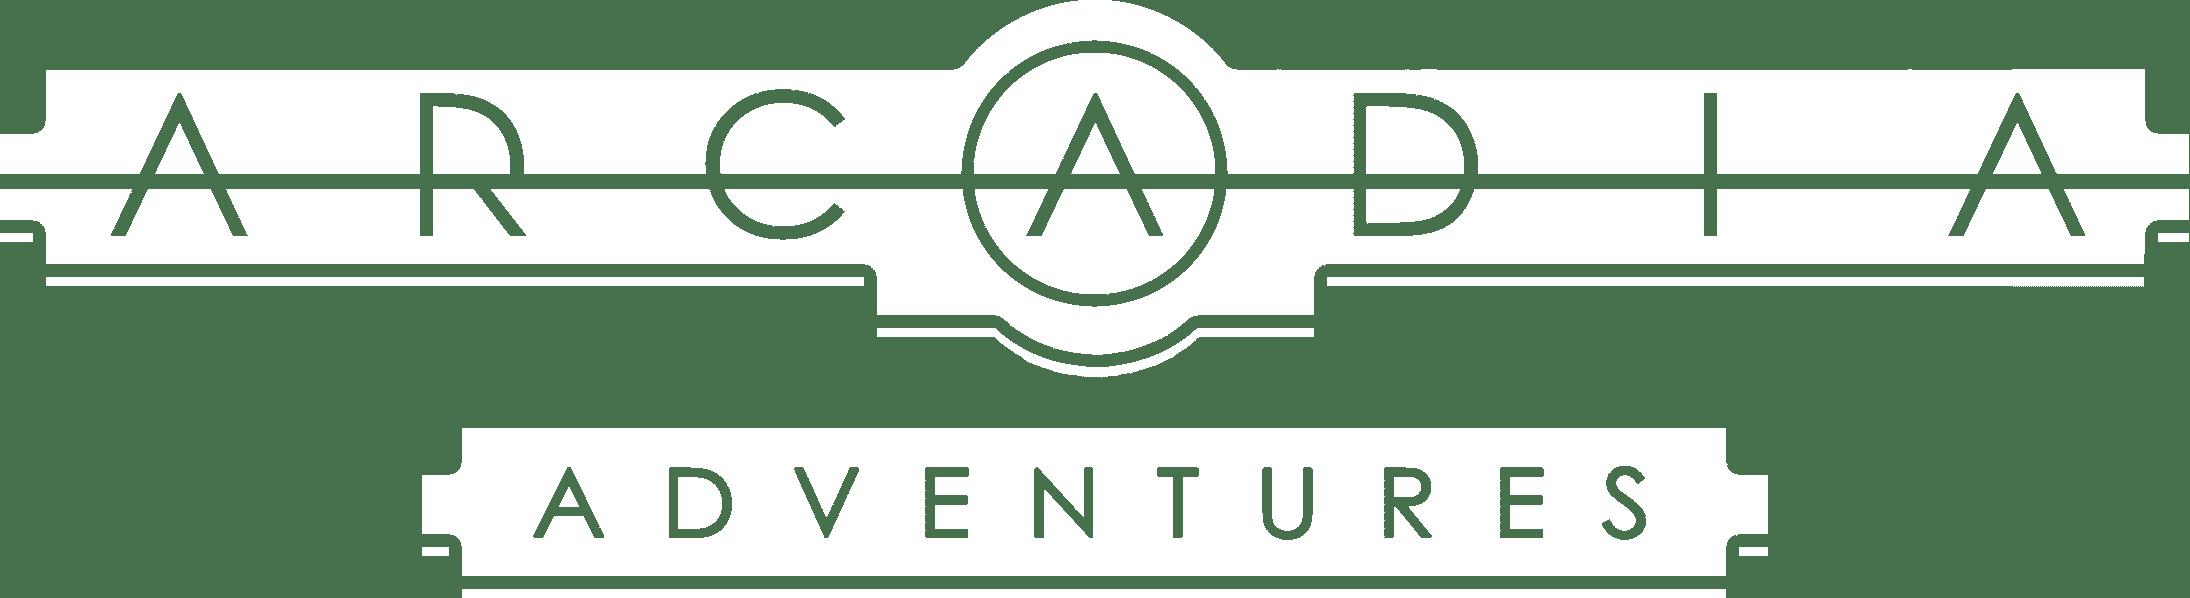 arcadia adventures logo